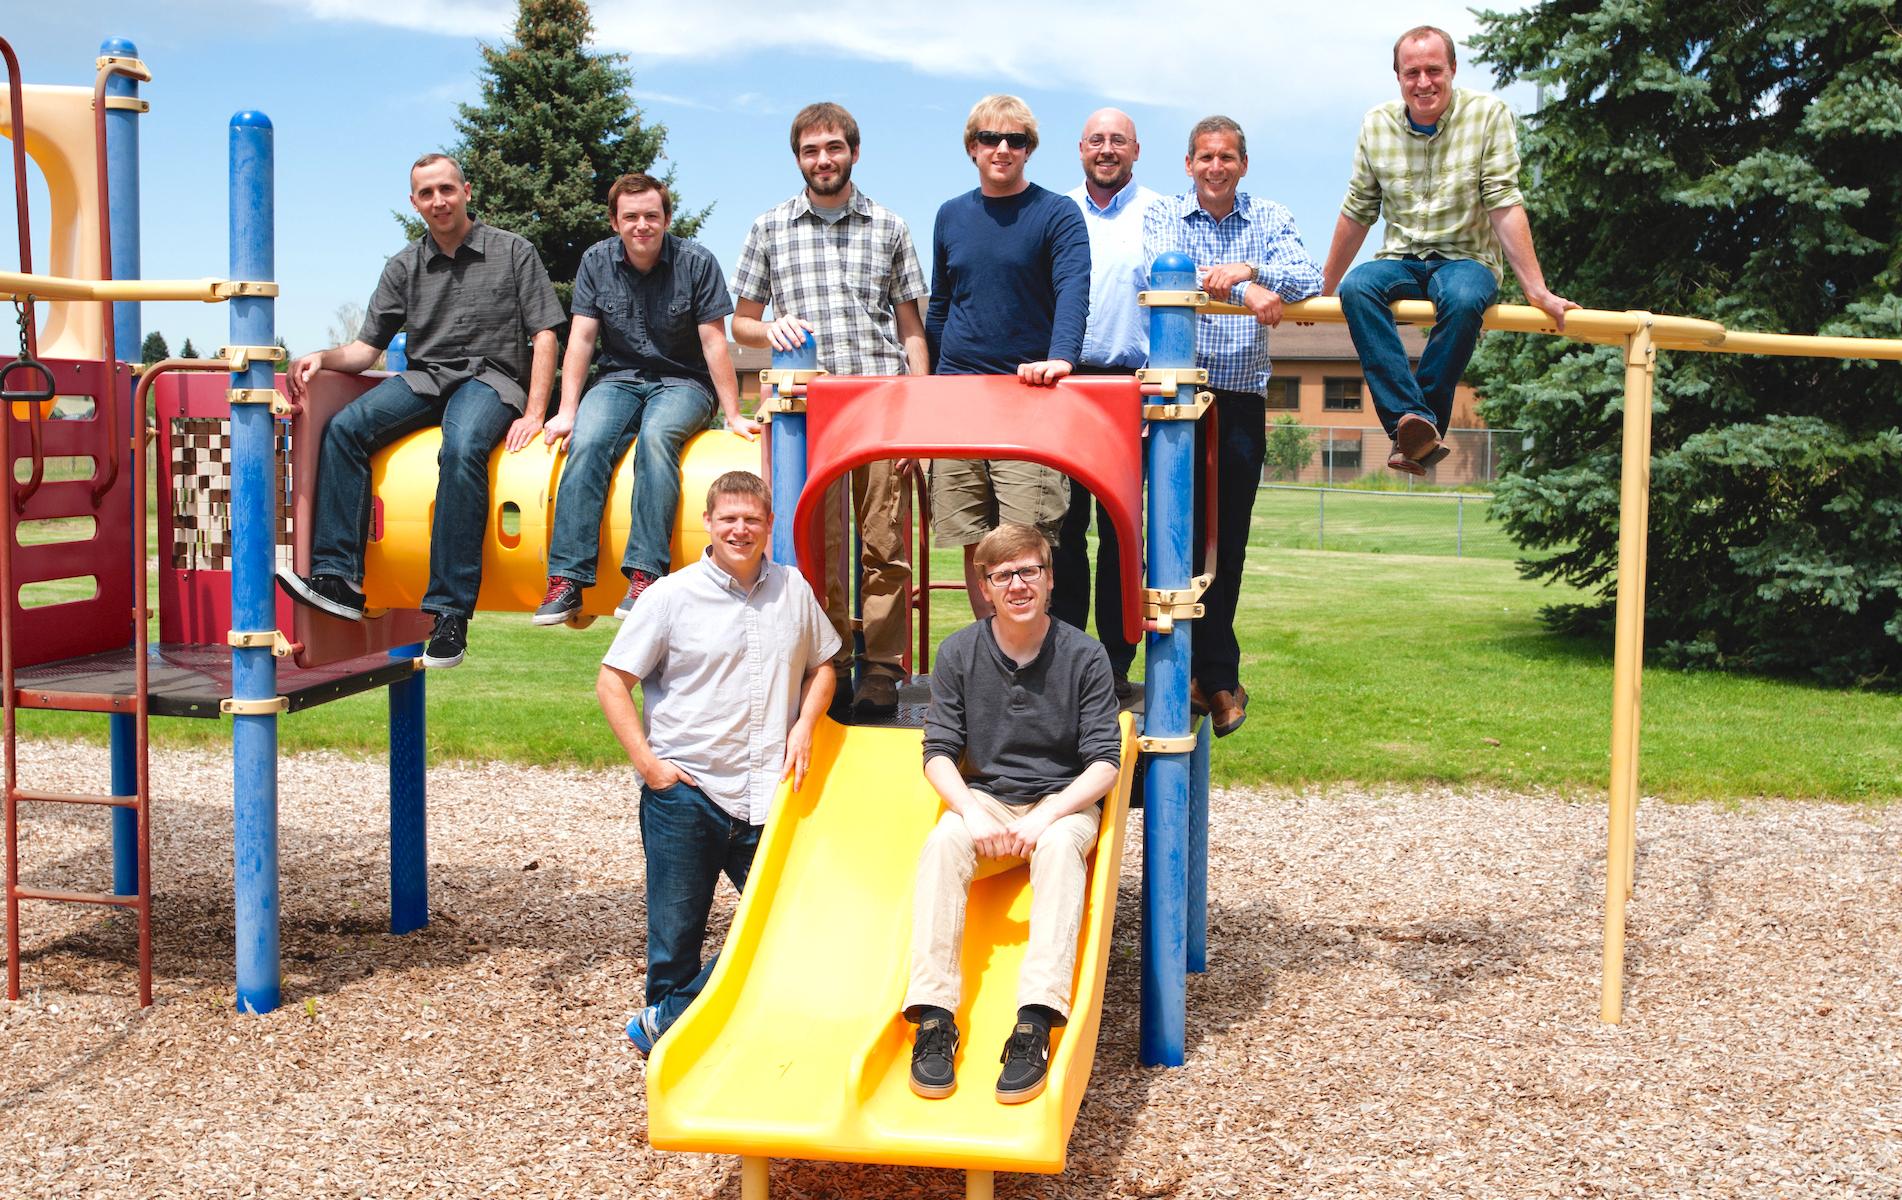 quiq customer messaging staff poses on playground equipment